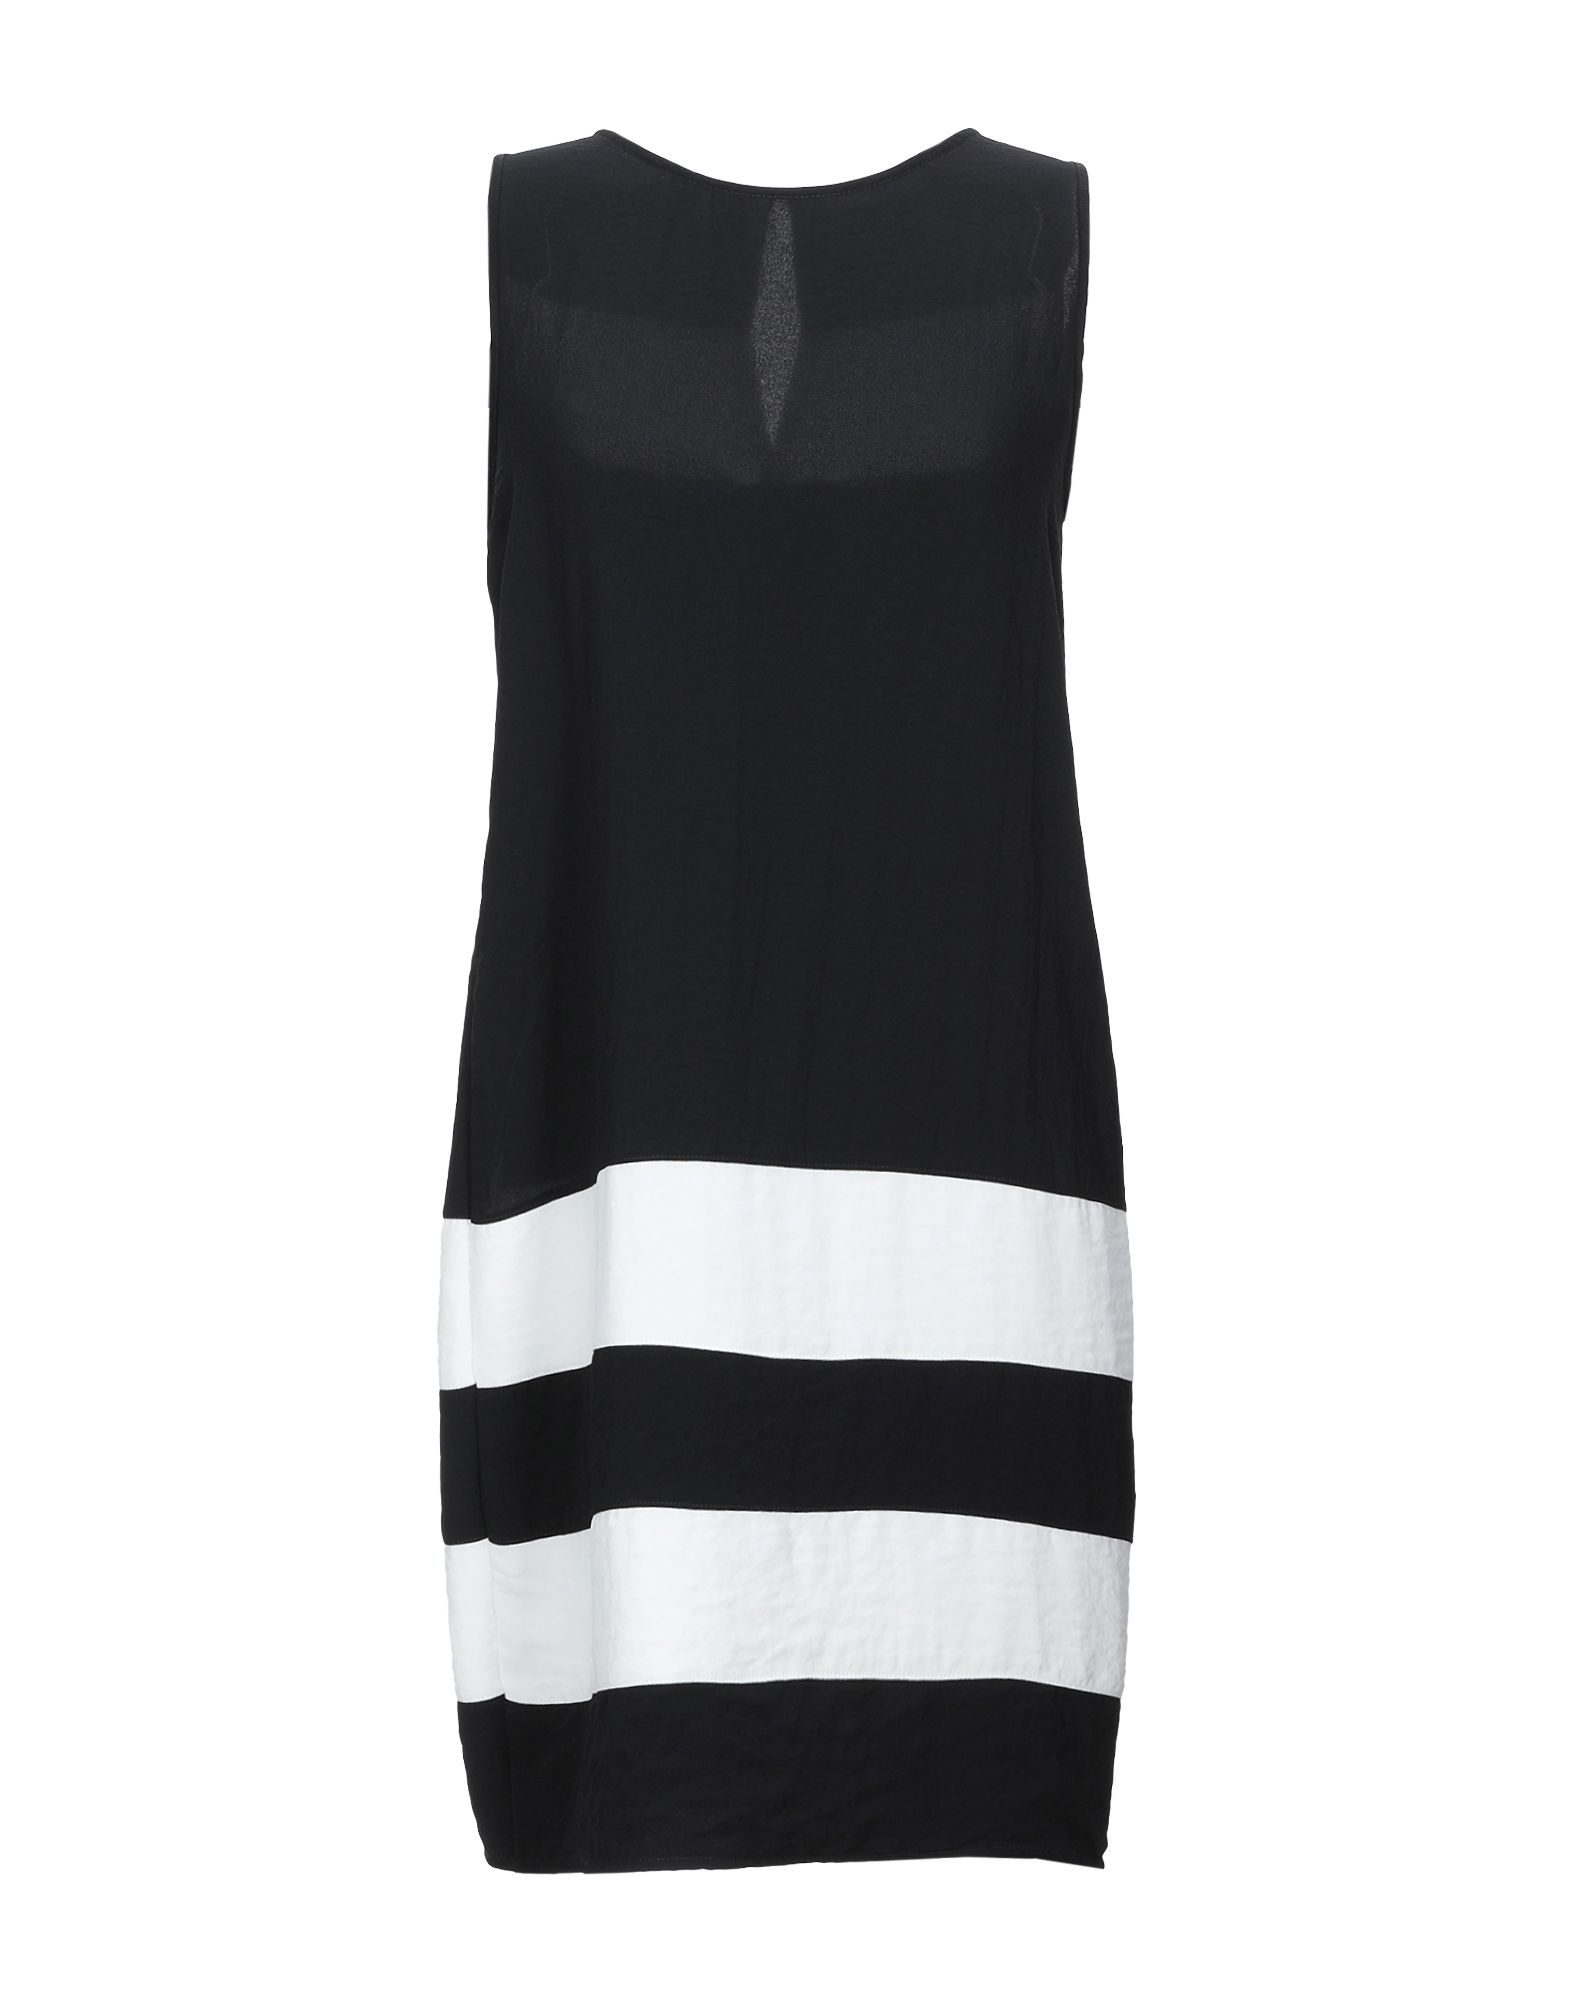 Фото - JT' Â JE T' ÂLENE Короткое платье t skirt зеленое короткое платье